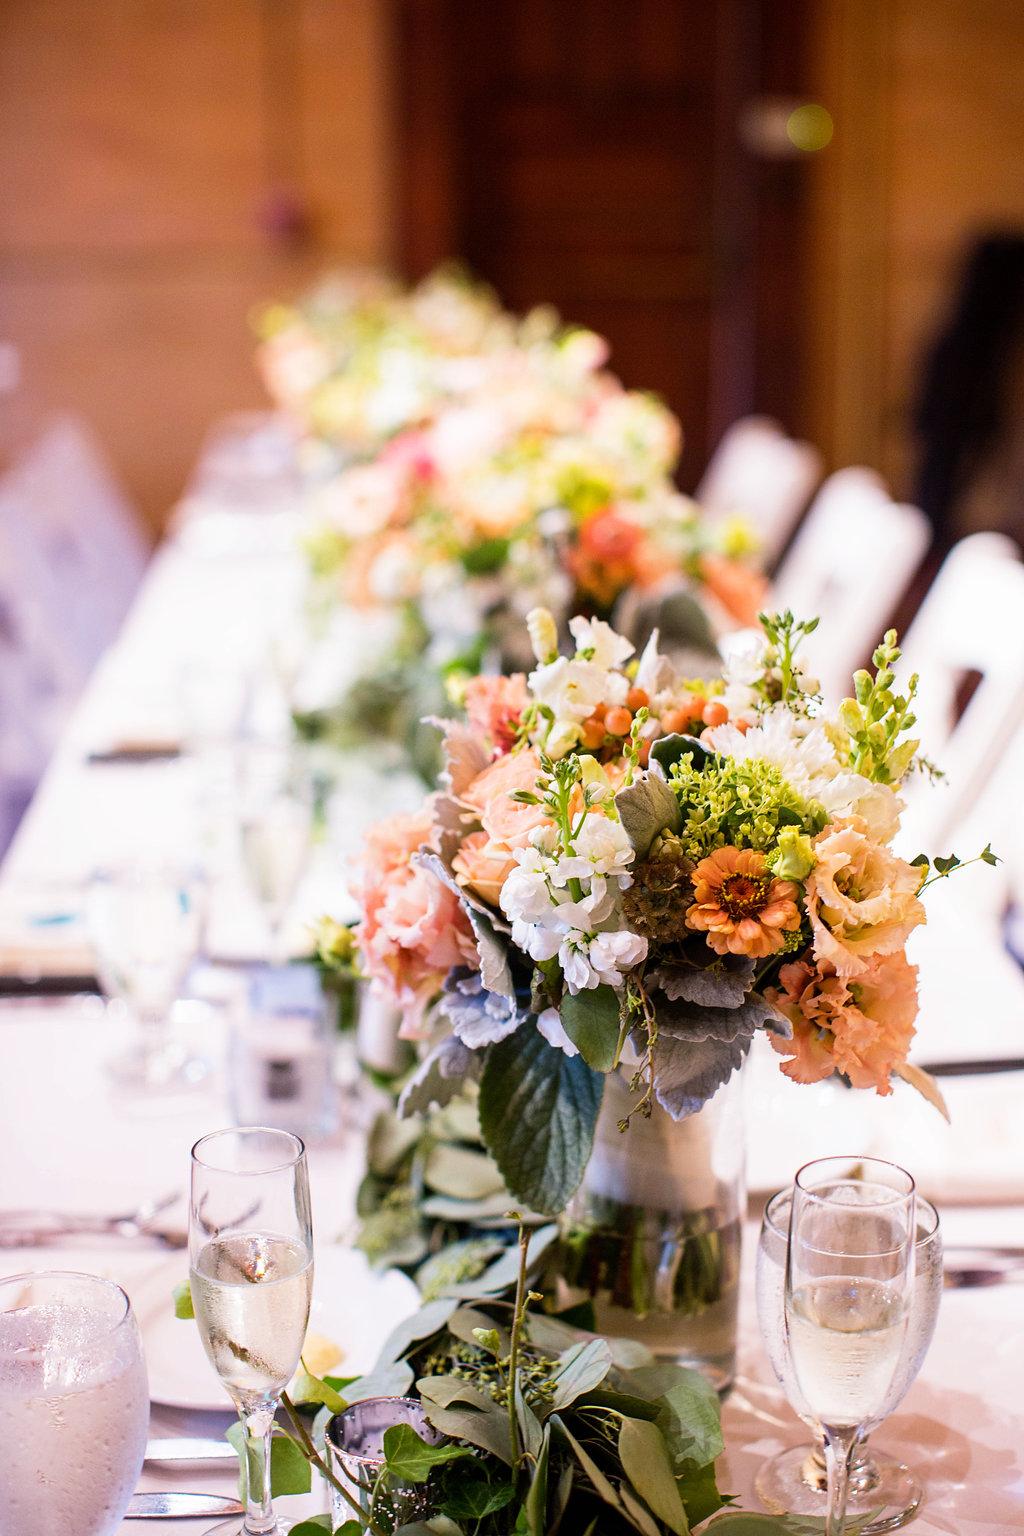 Linden Place Rhode Island Wedding — The Overwhelmed Bride Wedding Blog